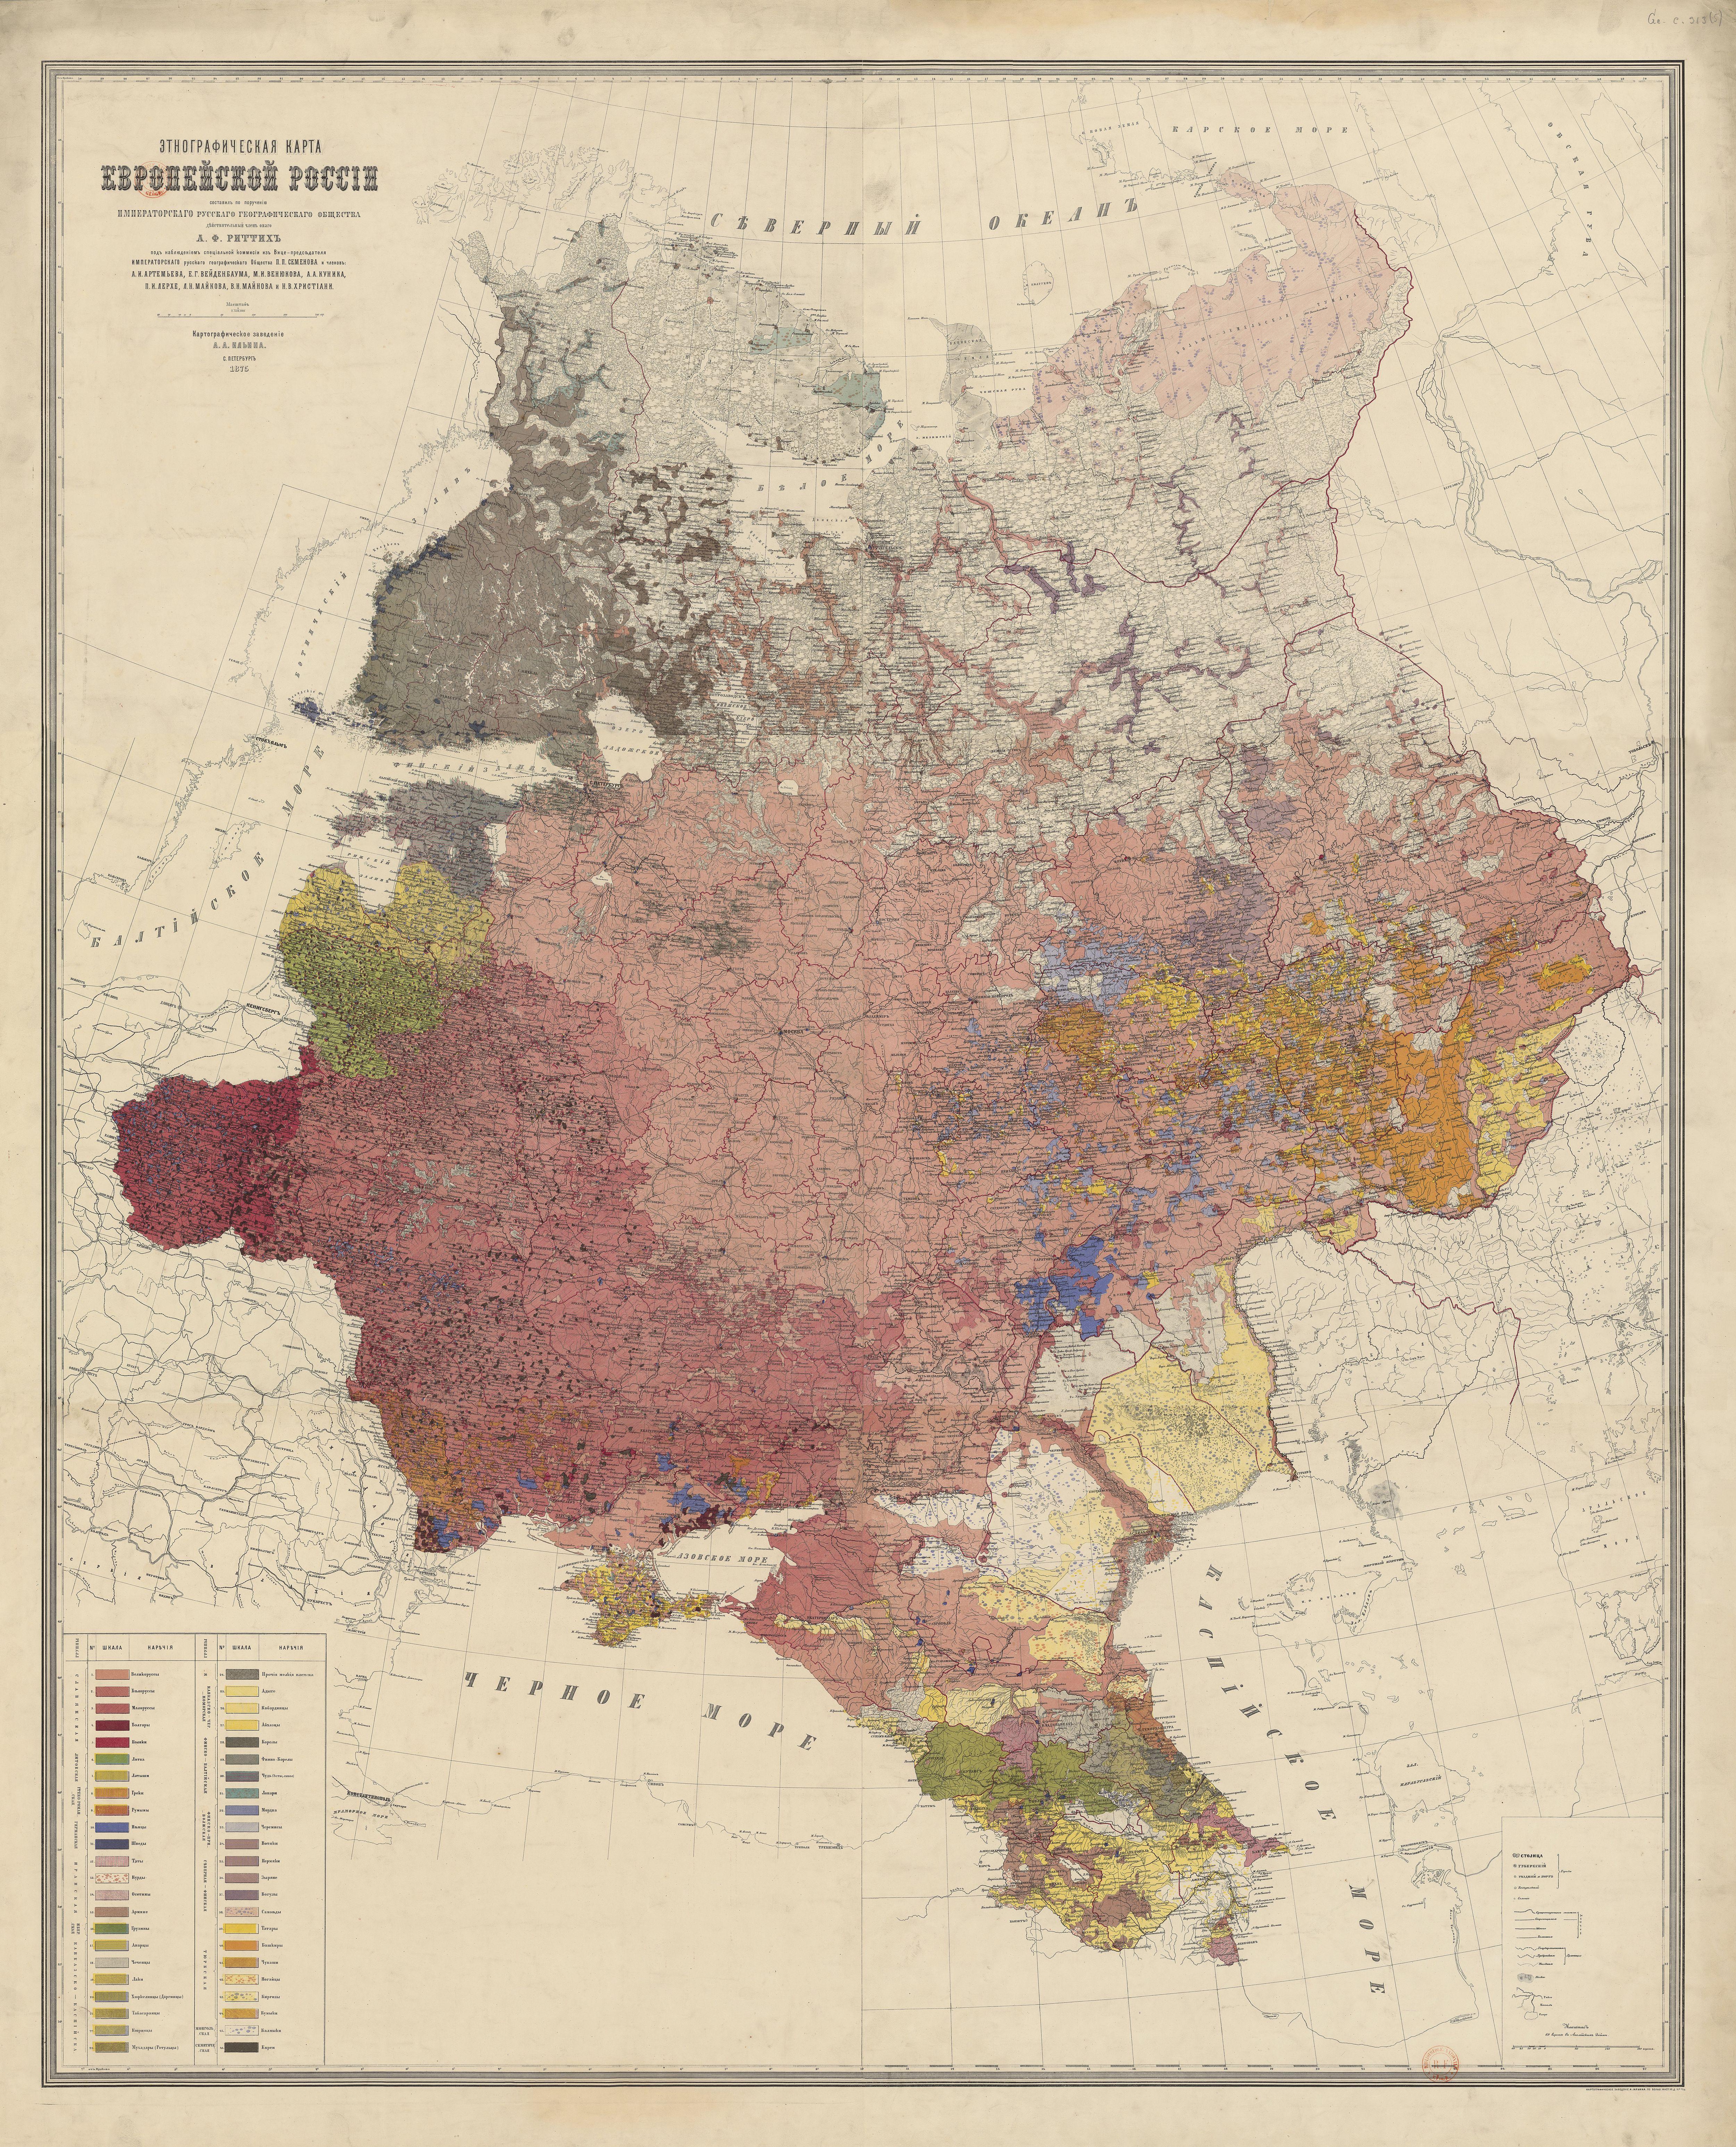 1875 in Russia